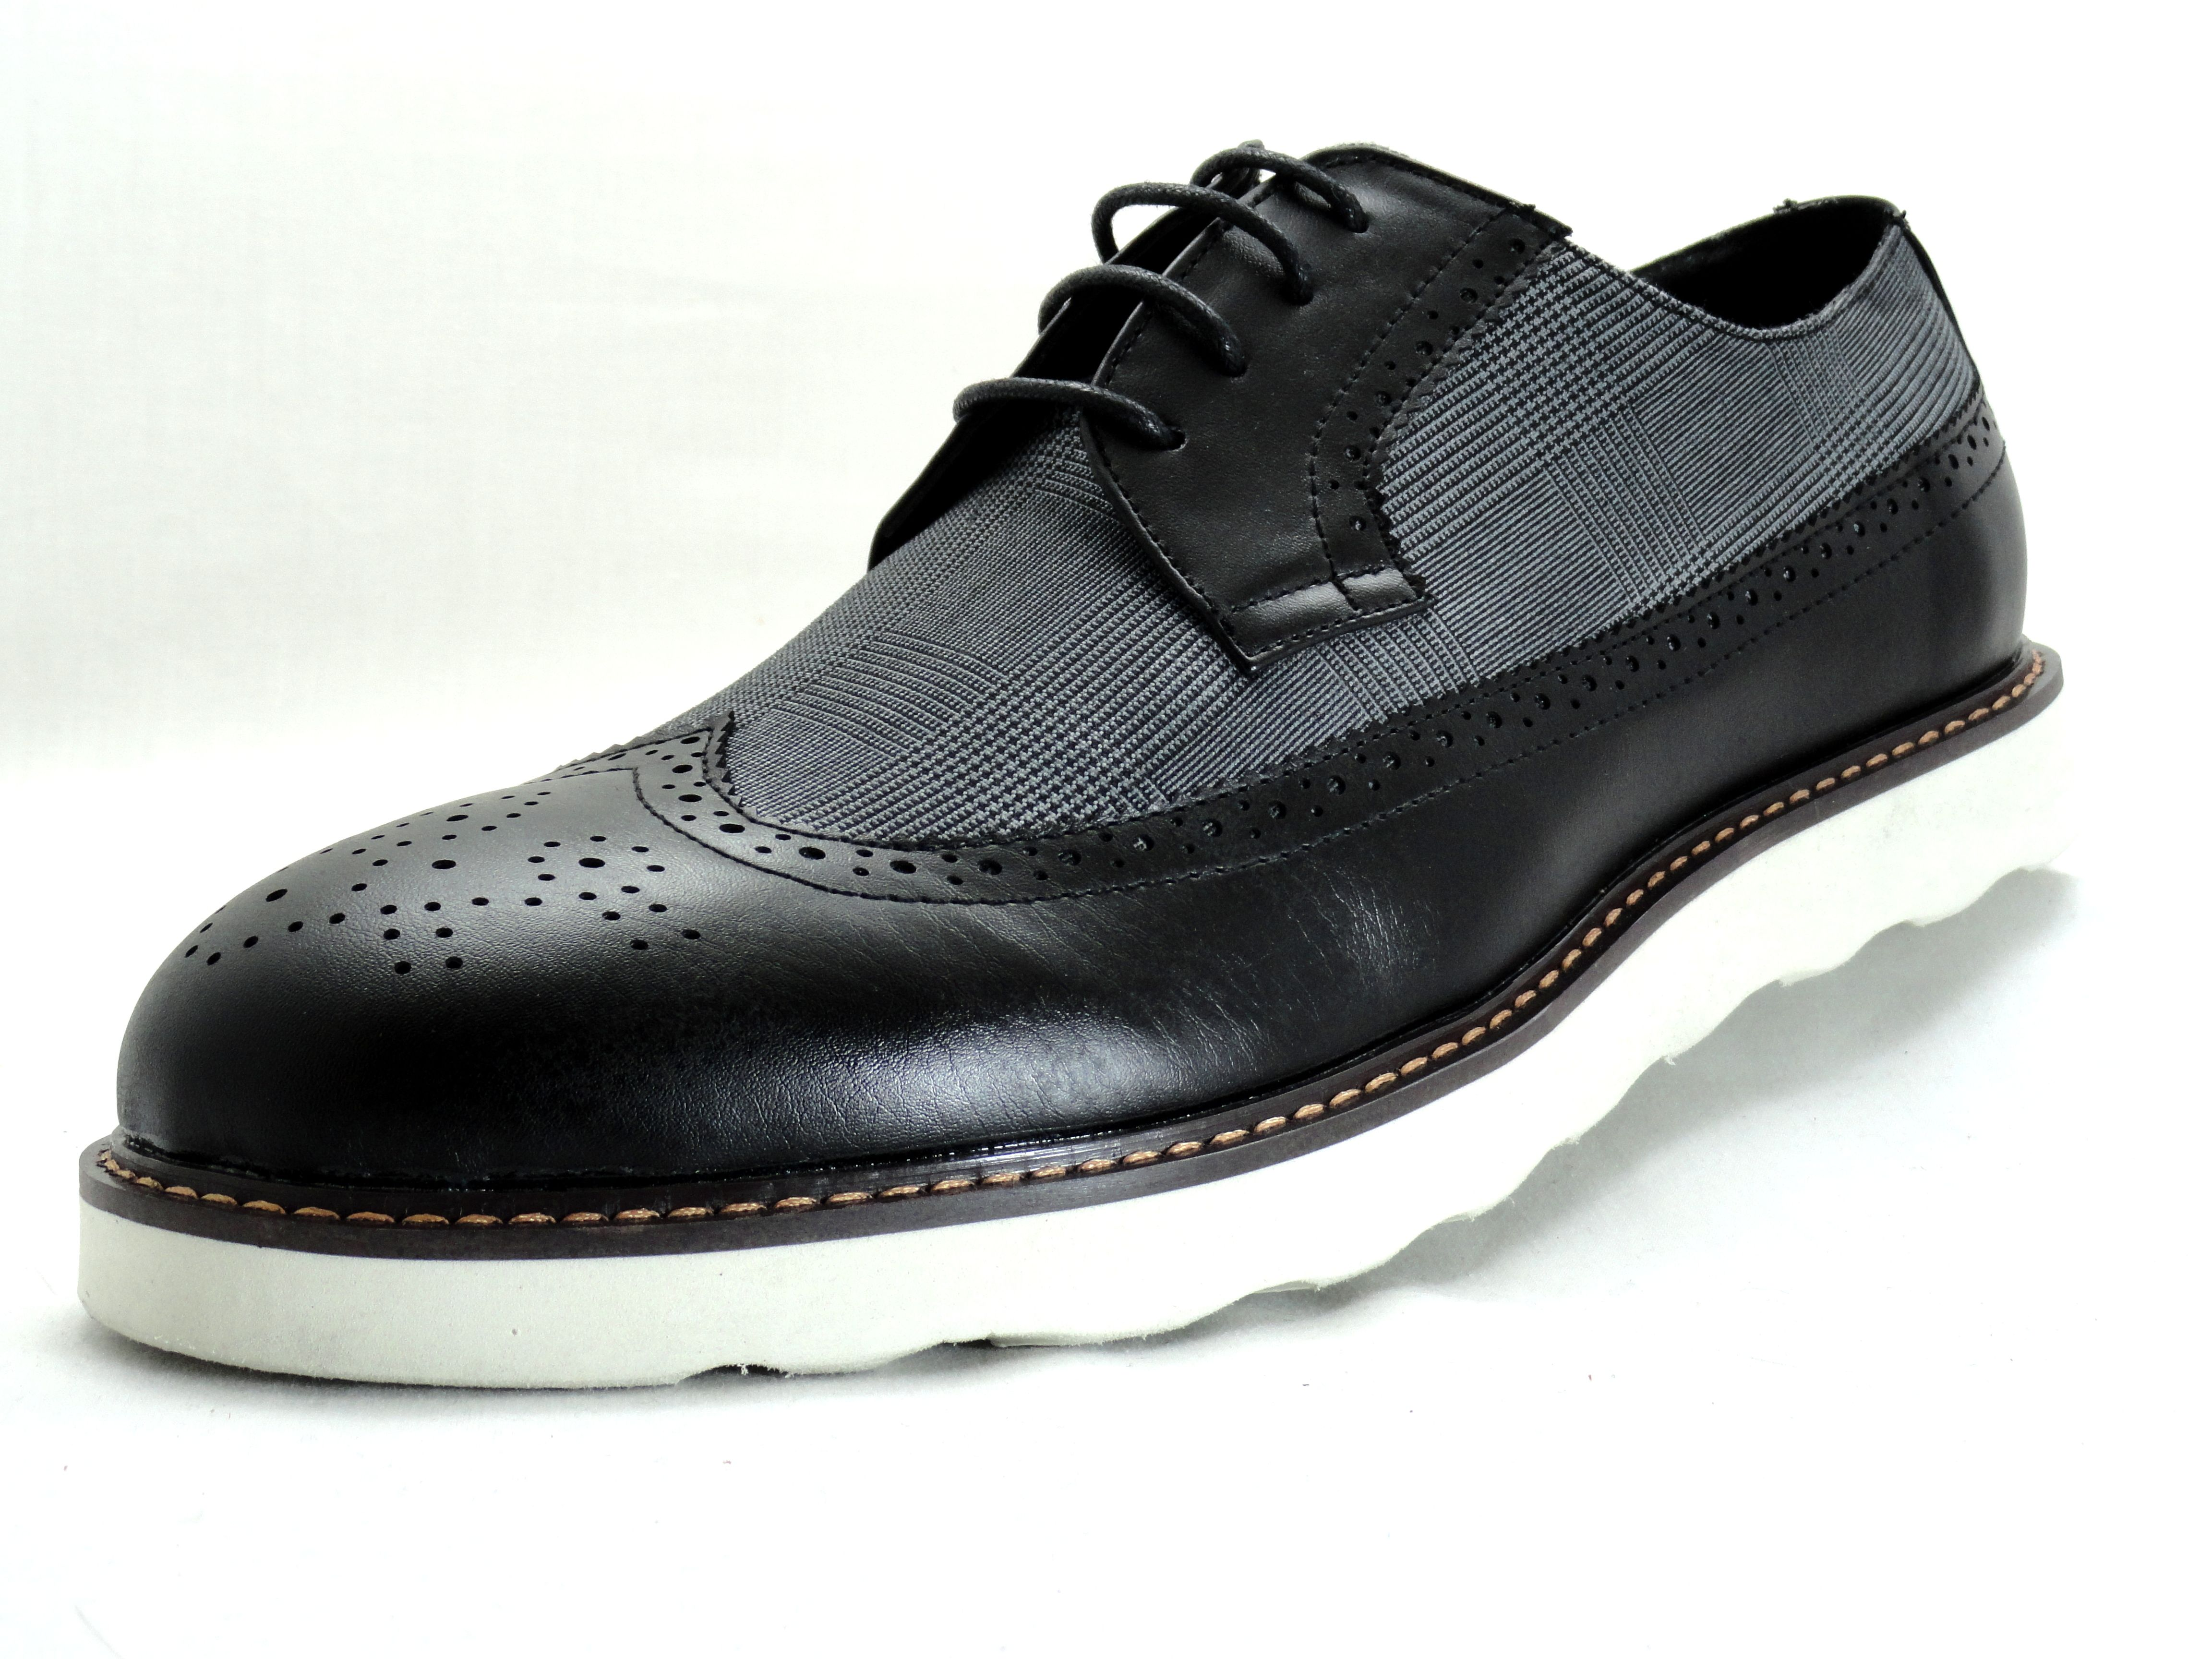 mens dress shoes imarc black oxford lace up with plaid